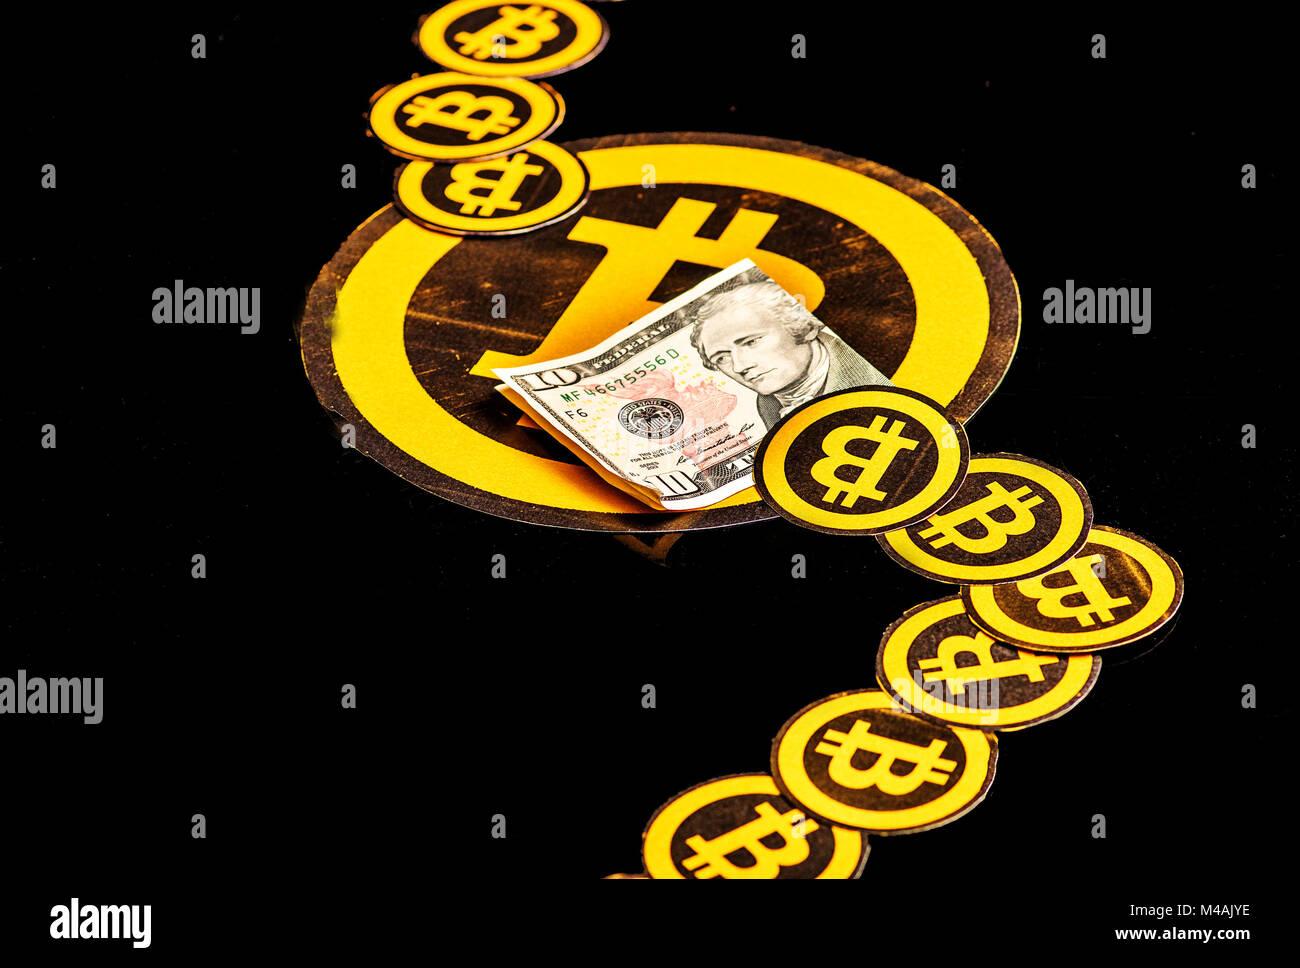 Bitcoins logos igl csgo betting